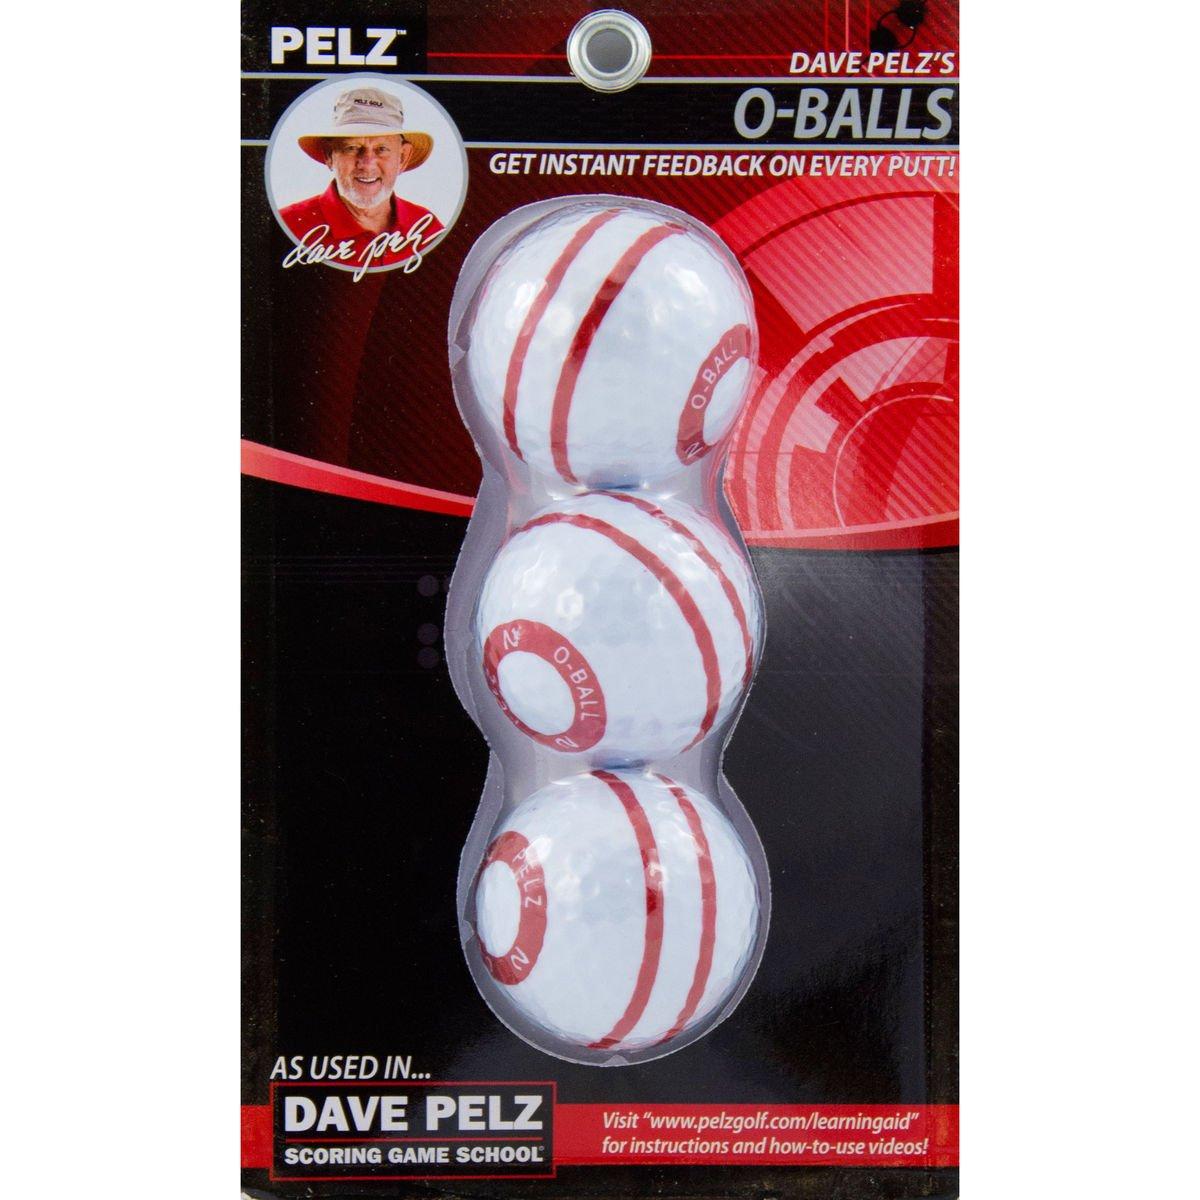 Dave Pelz's O-Ball 3 Pack